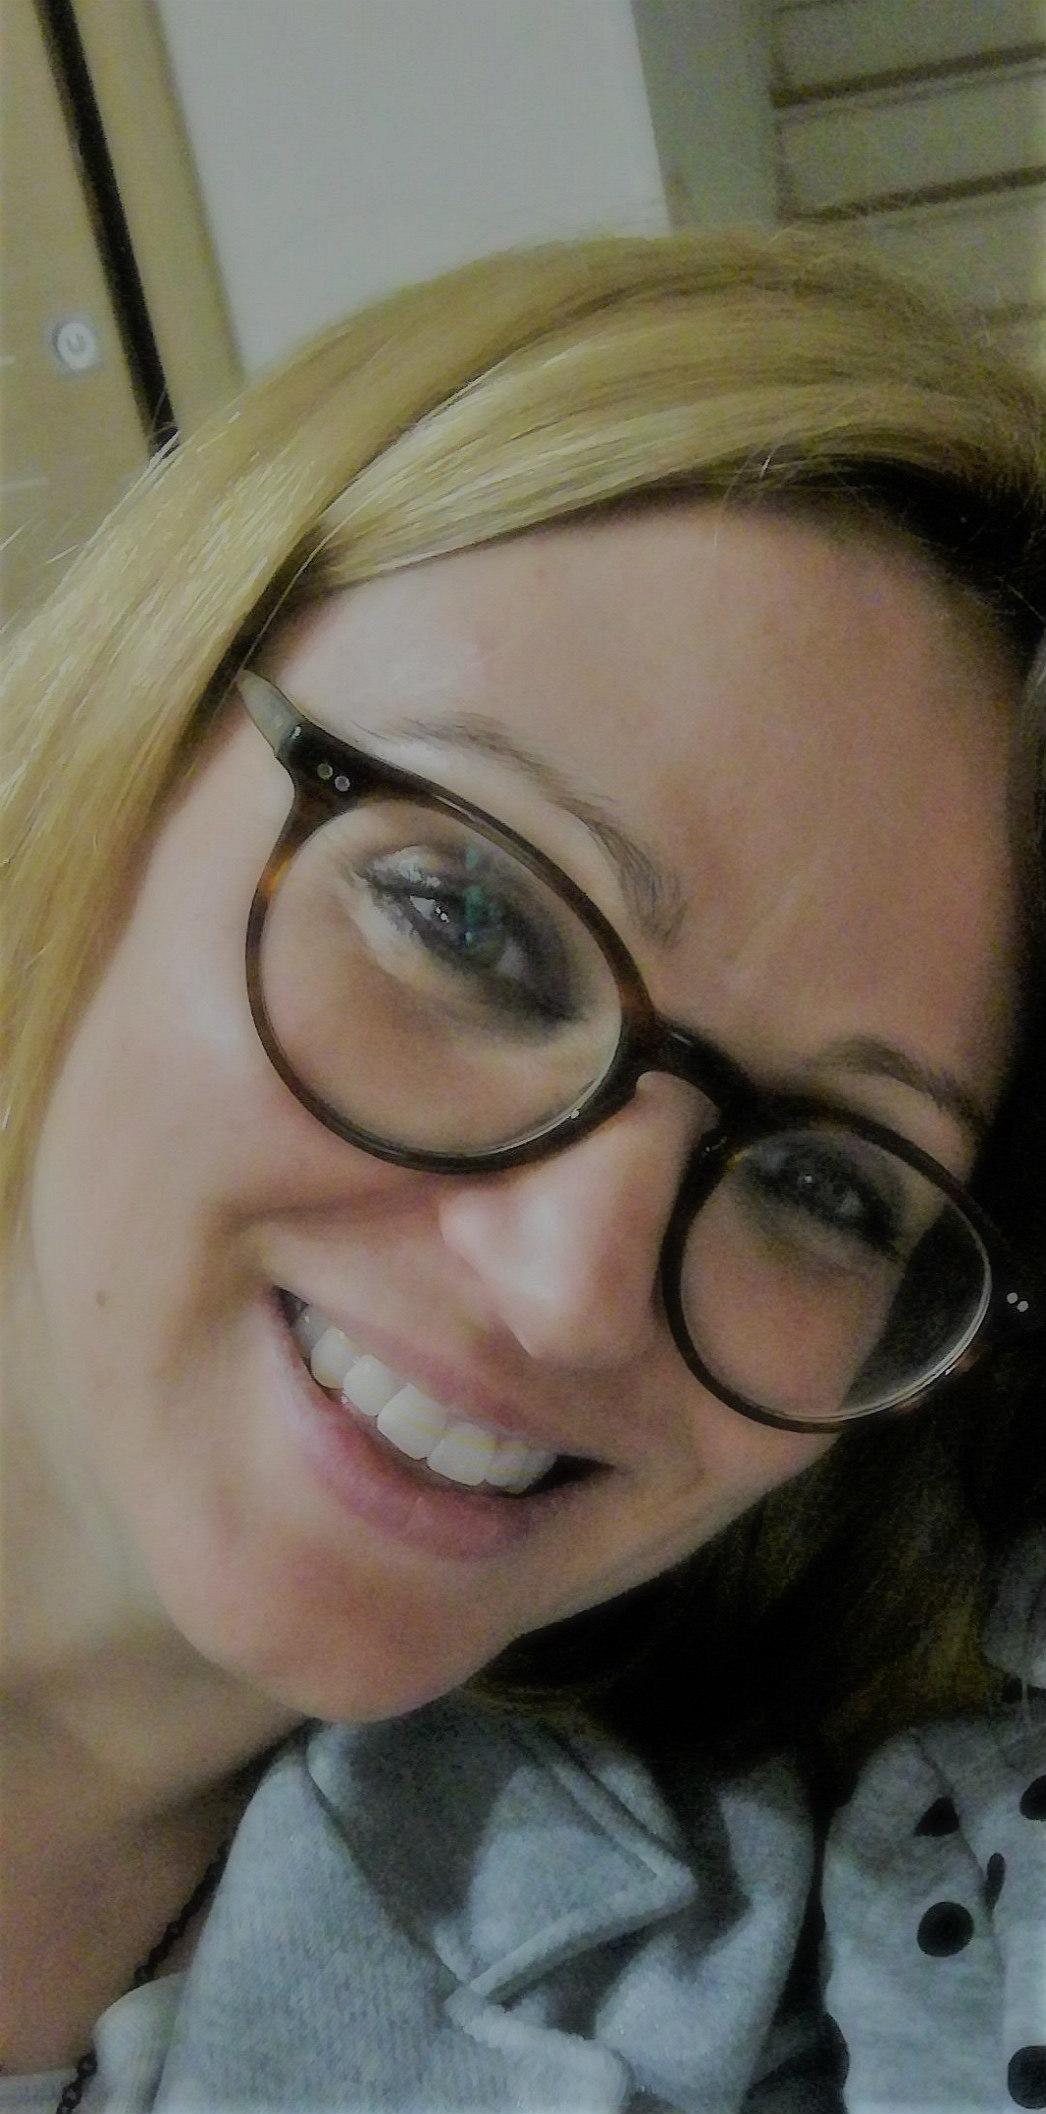 Laura Antonella COLACI